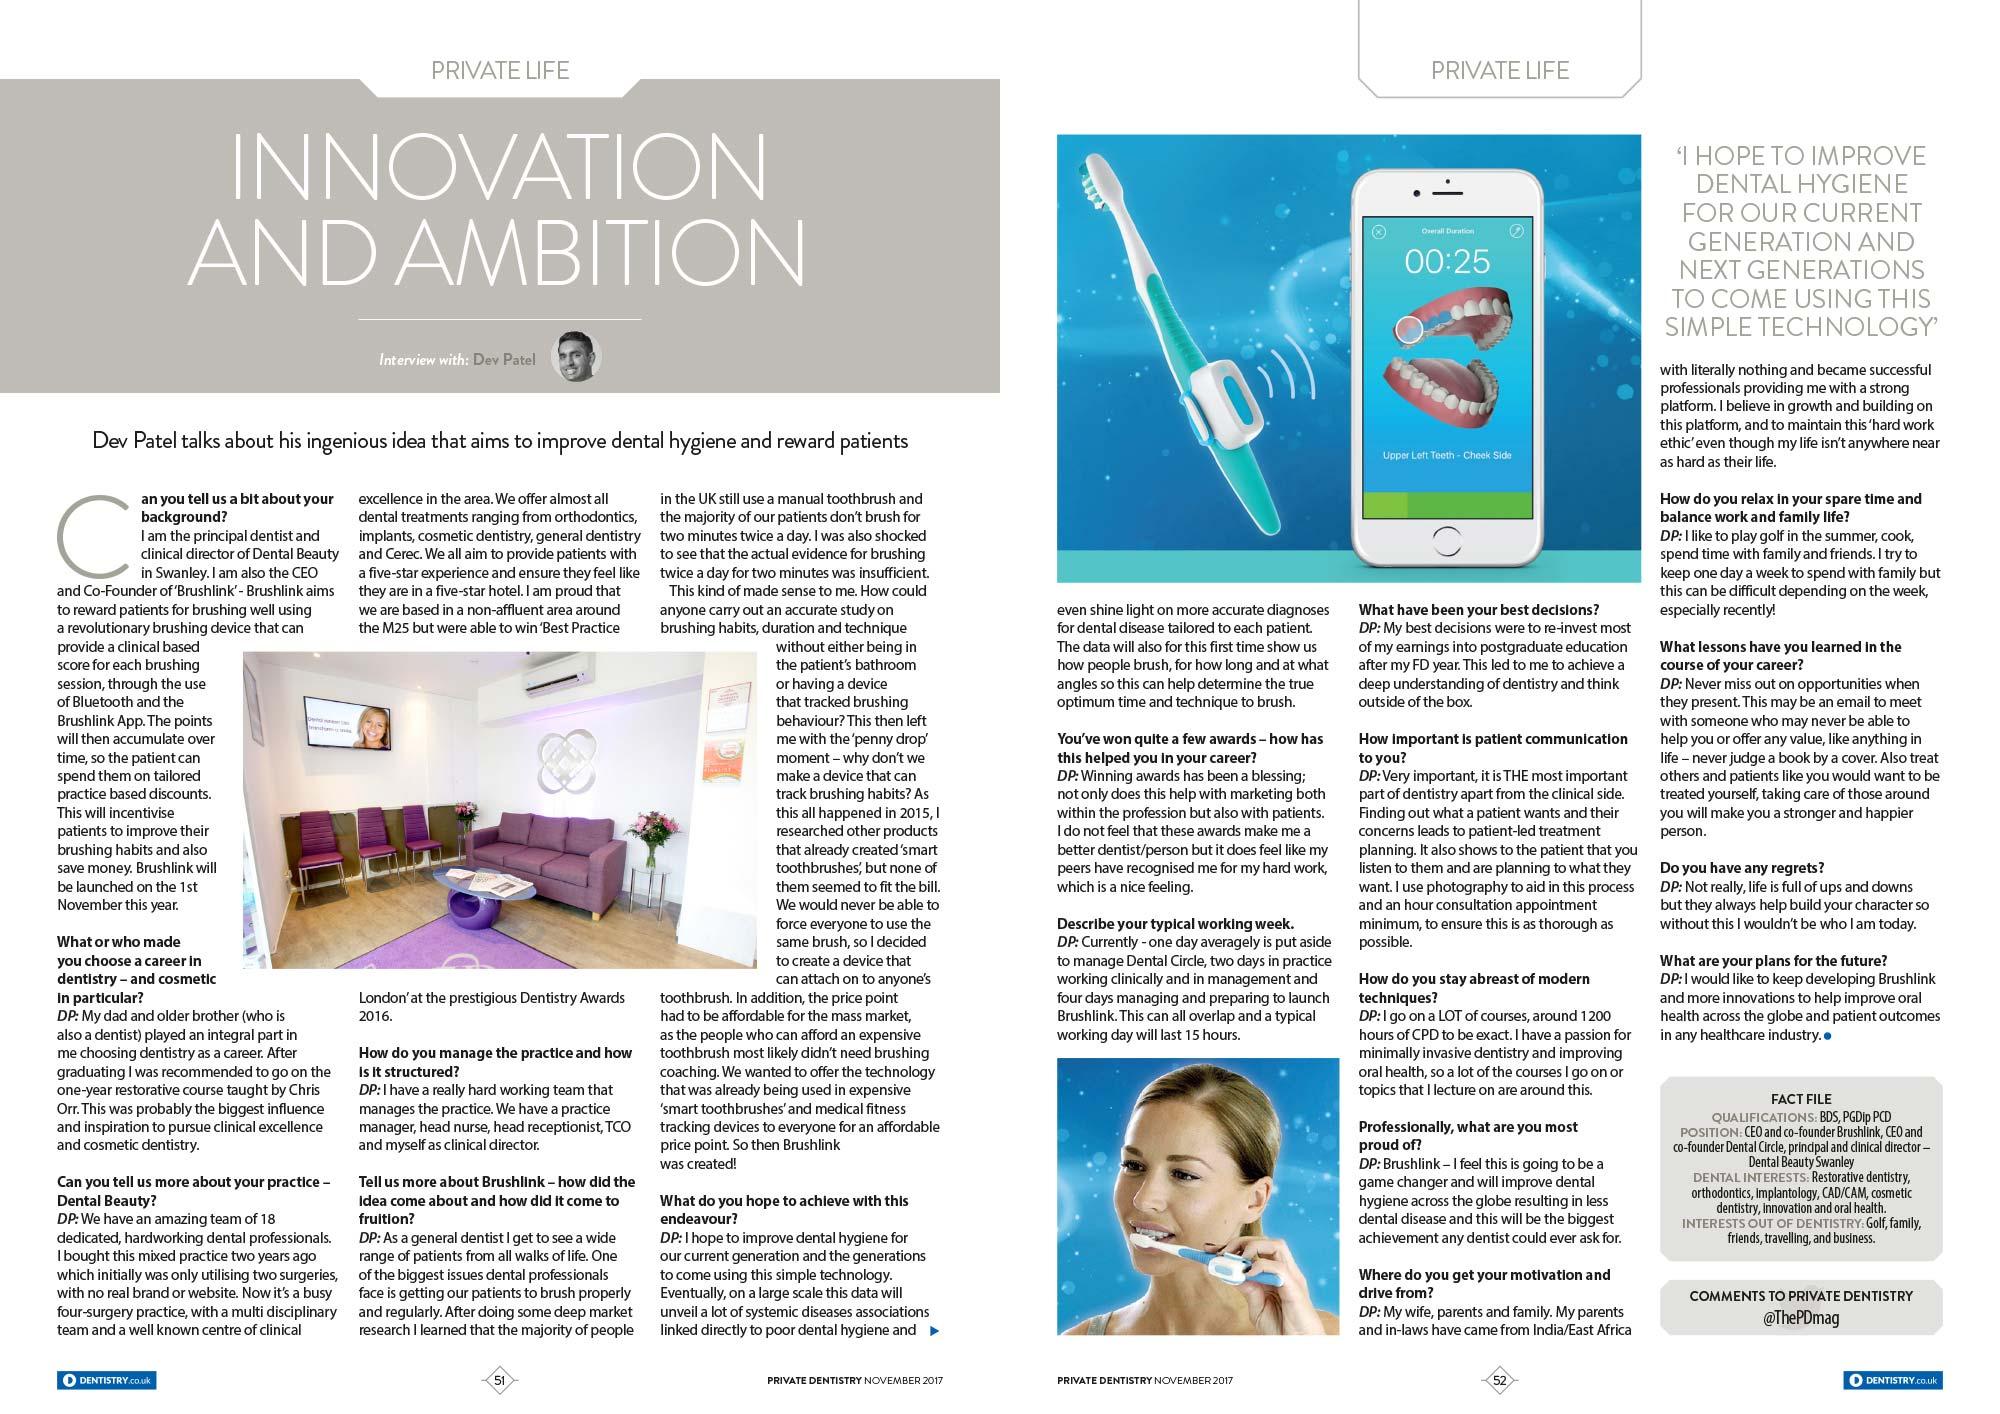 Private Dentisry Magazine Interview DP 11 11 17